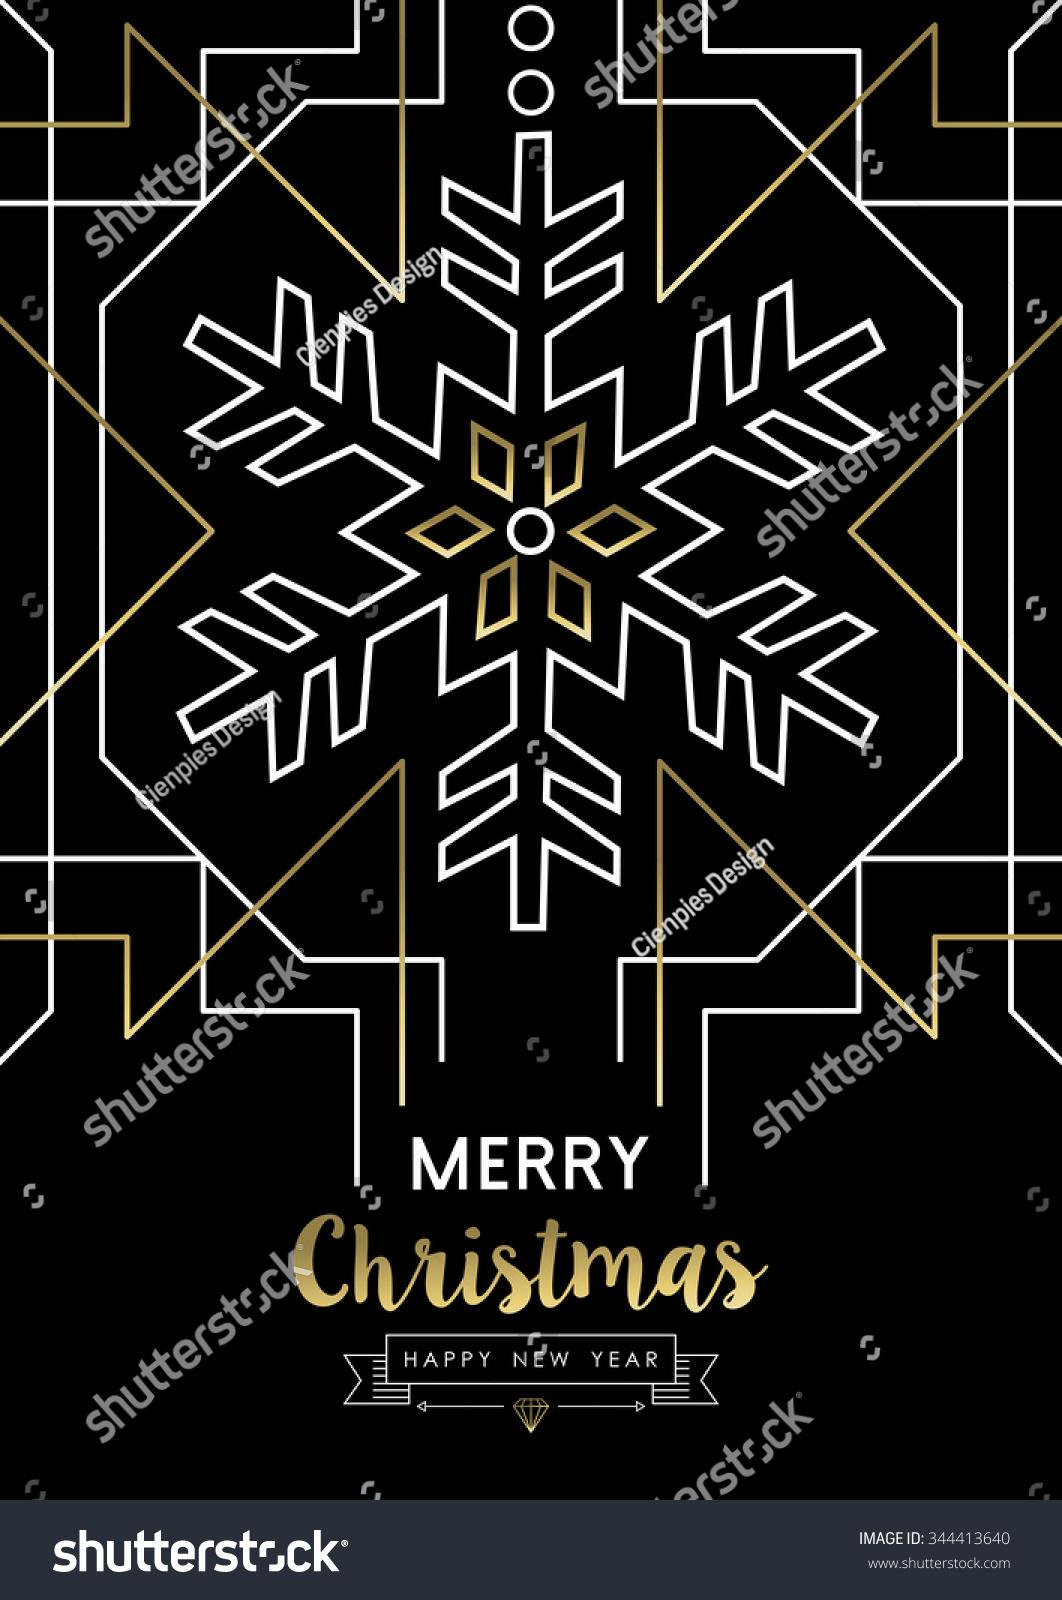 Merry Christmas Happy New Year Snowflake Stock Vector 344413640 ...